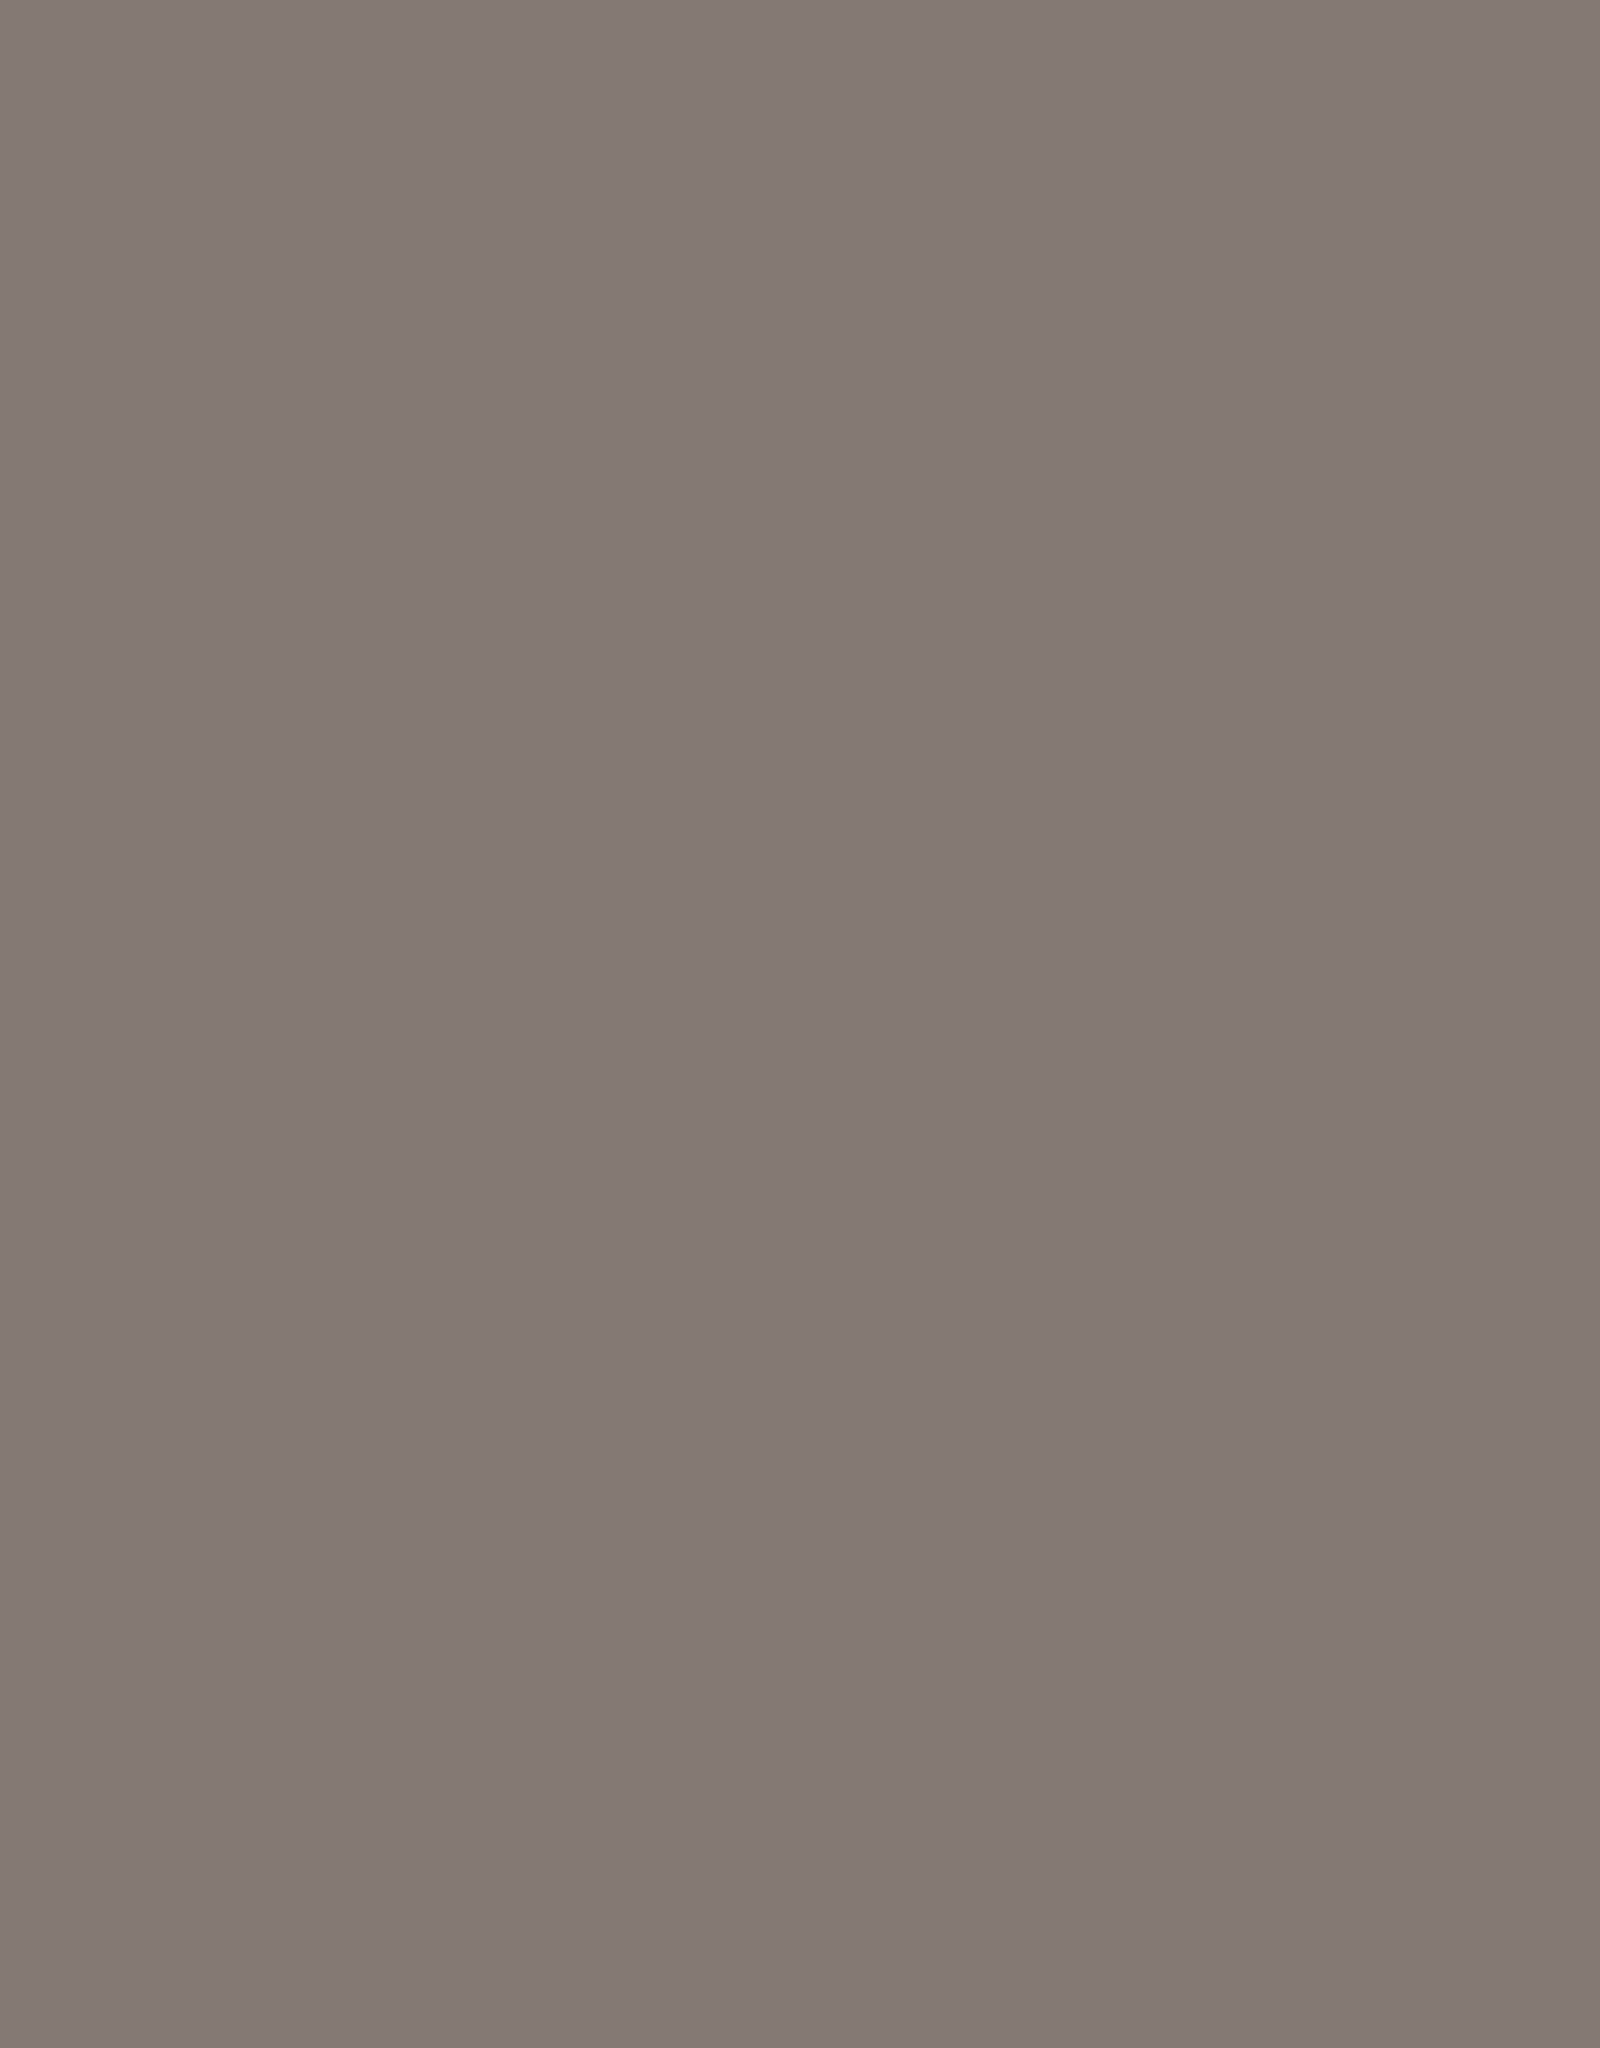 Siser Flexfolie 30cm A0018 grey per 10cm